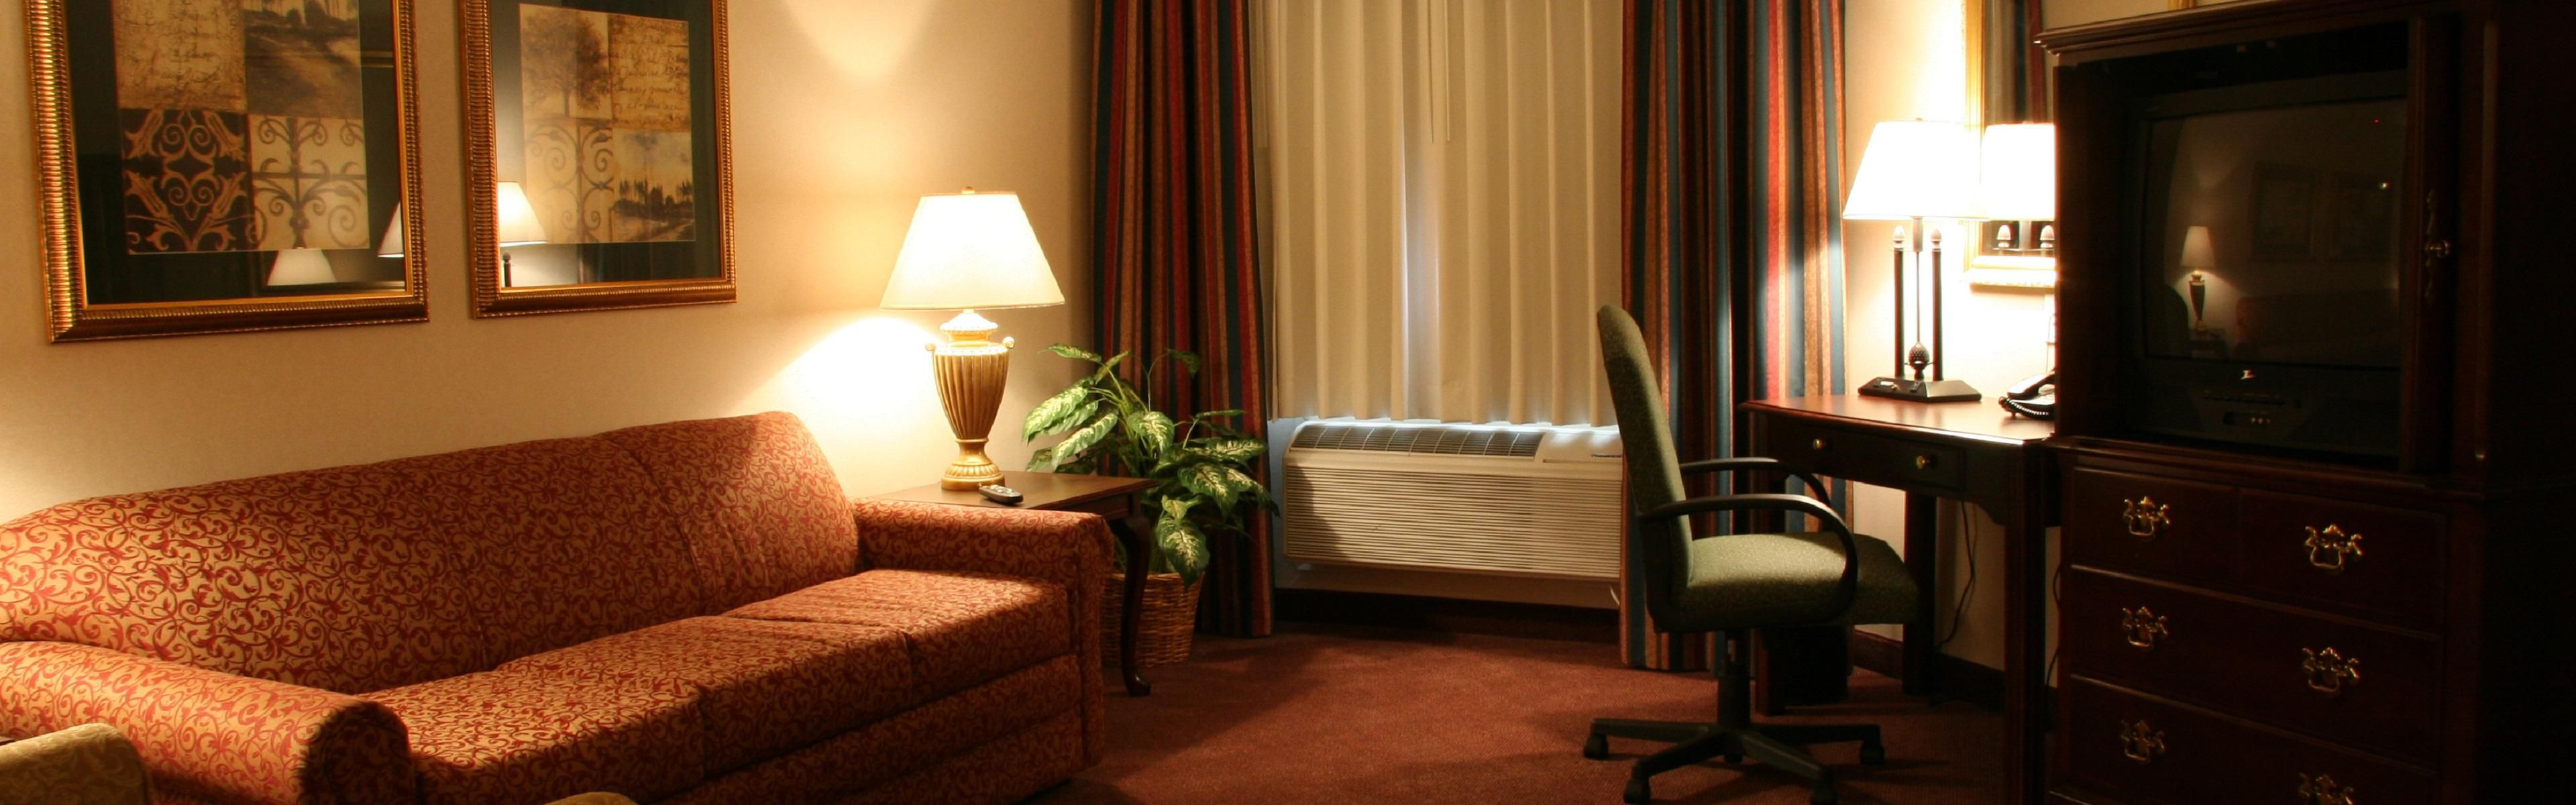 Holiday Inn Selma-Swancourt image 1